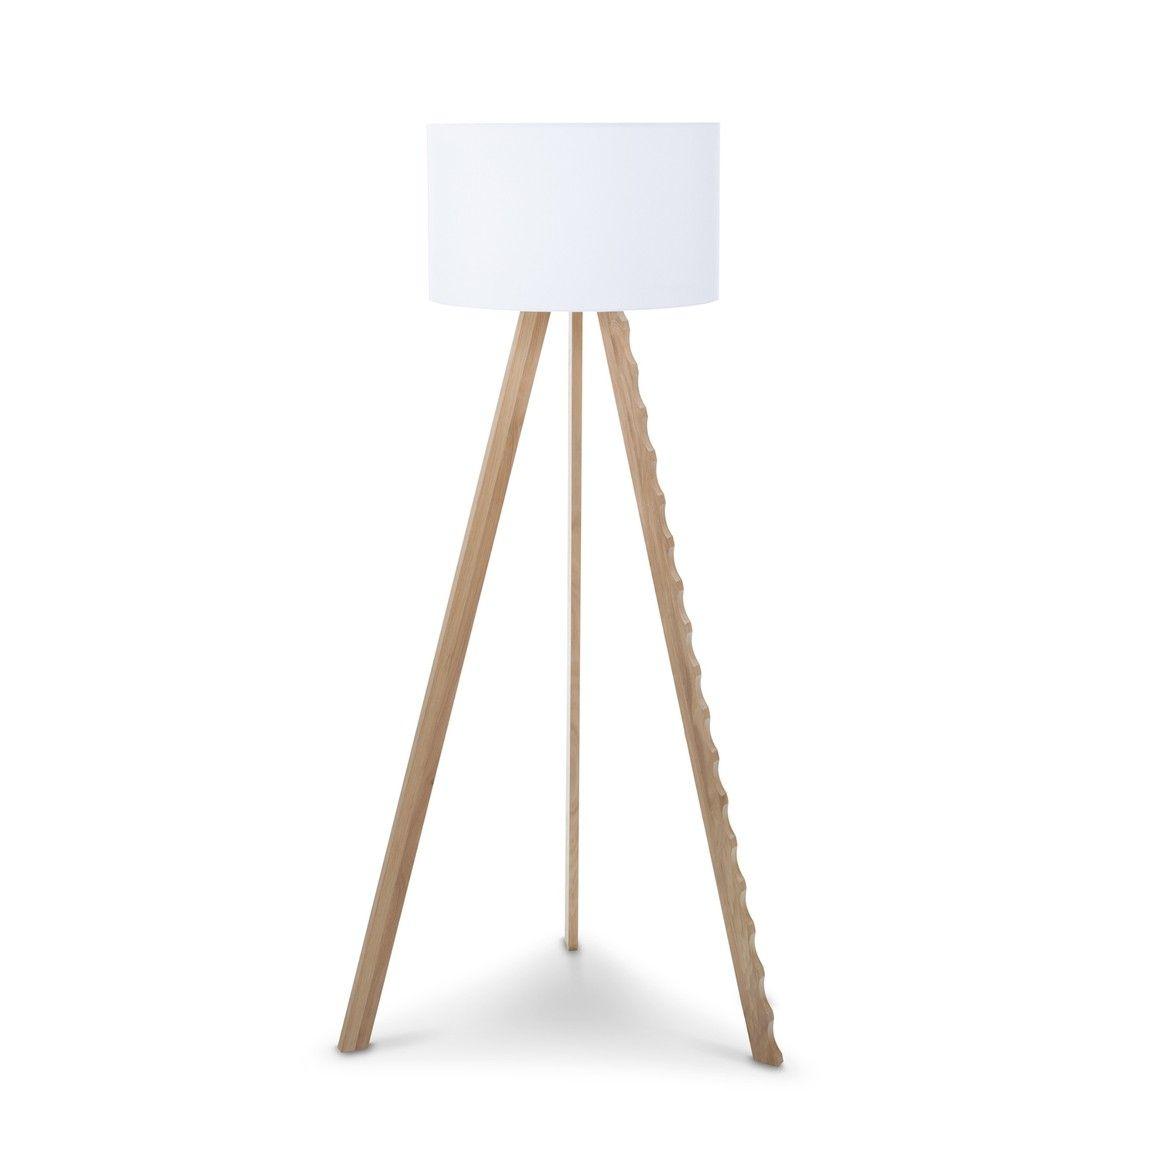 Lampadaire Blanc 3 Pieds Chene Petit Abat Jour 160cm Nia Blanc 12613900 0 Stehlampe Stehlampe Weiss Lampen